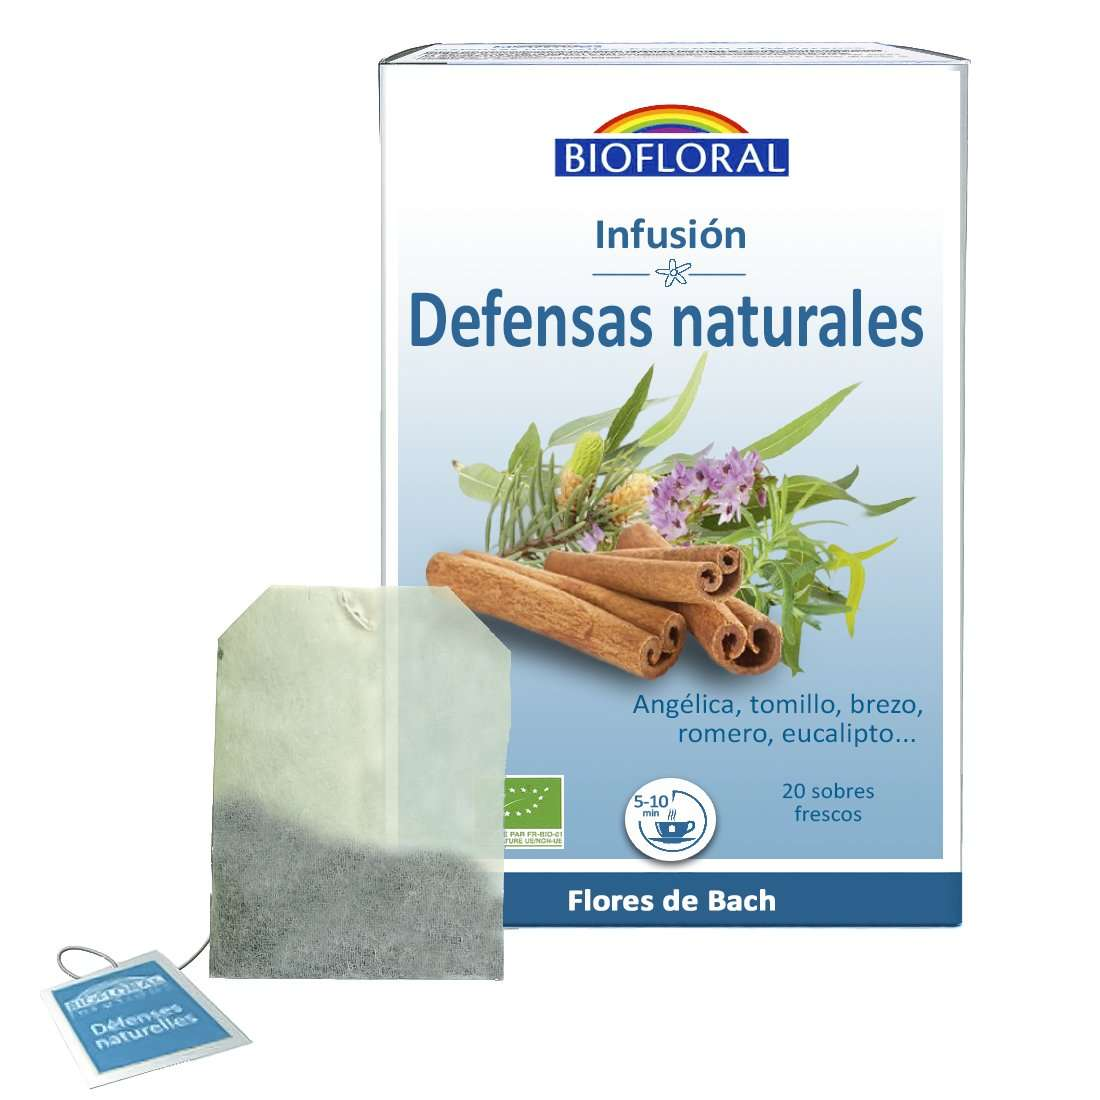 Infusión Defensas Naturales Flores de Bach Biofloral 20 sobres